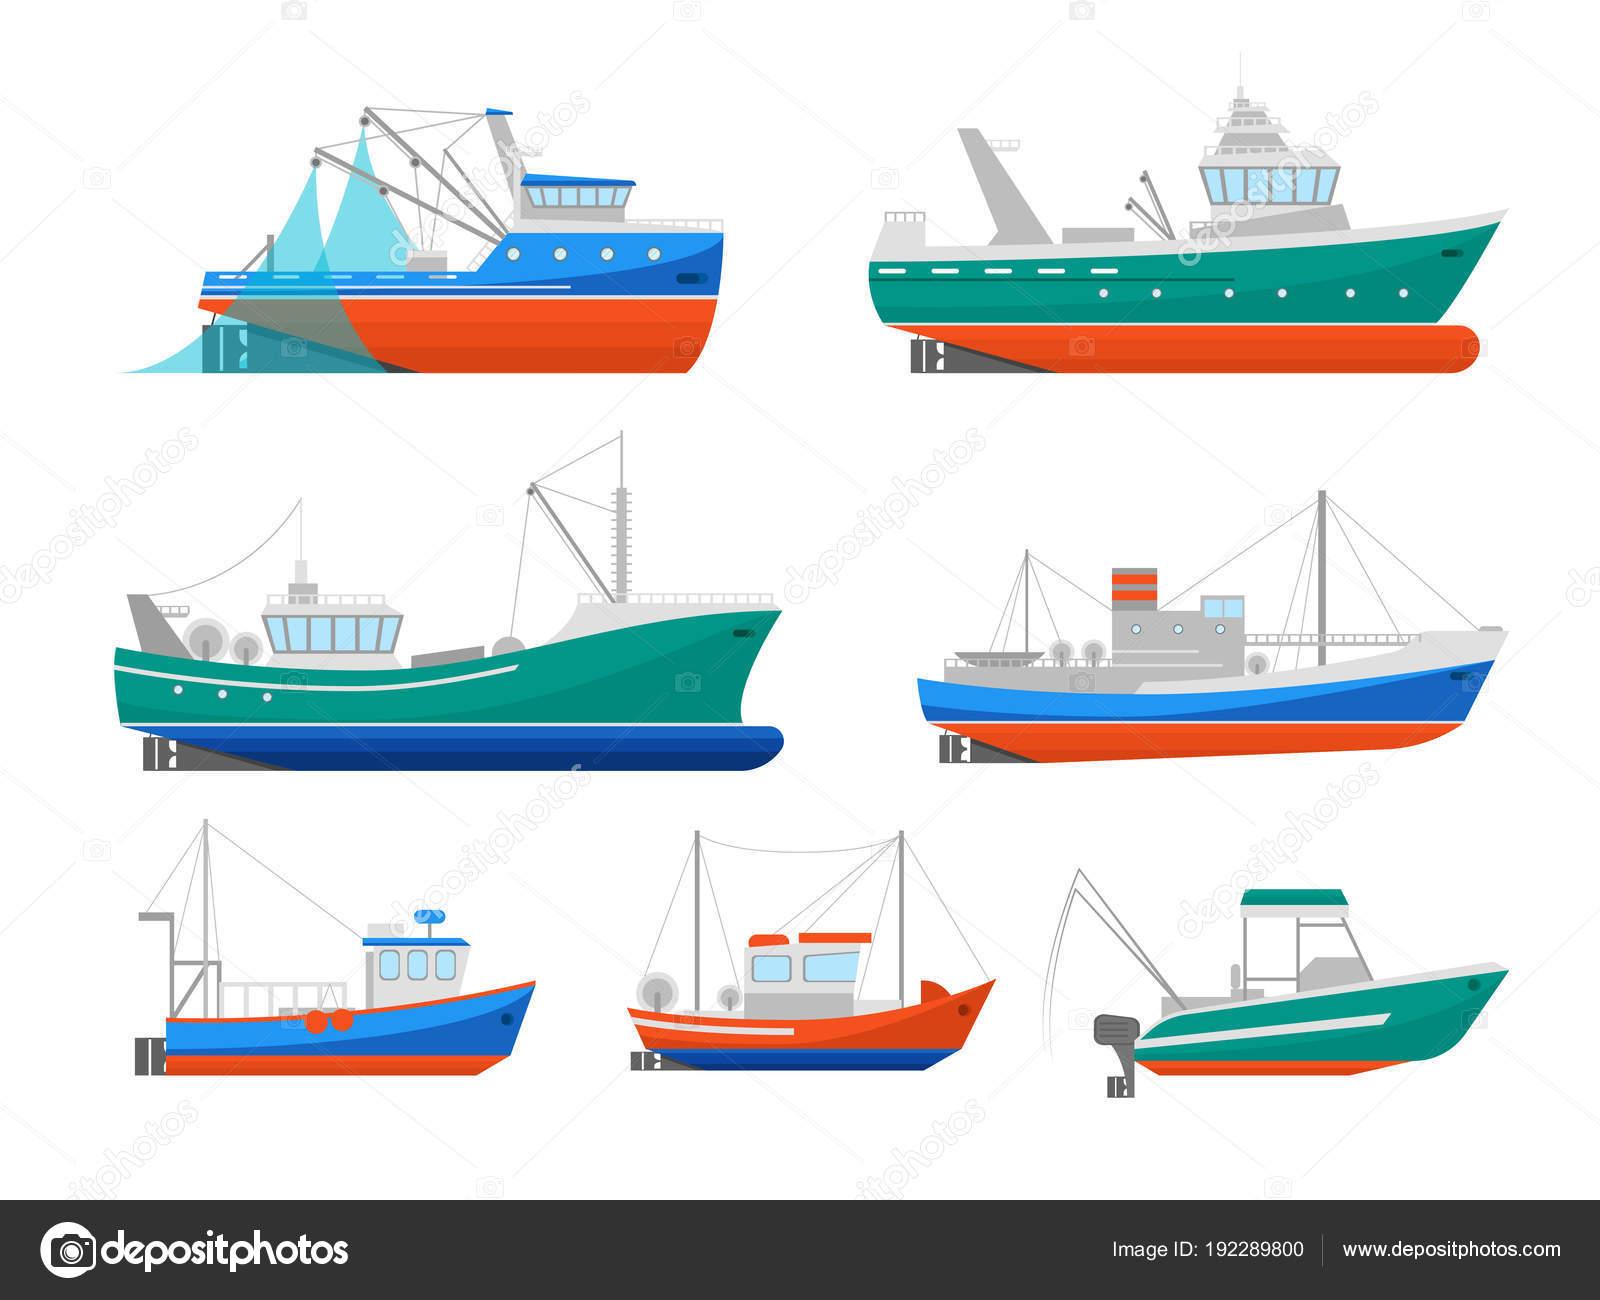 Dibujos Pesca Industrial Animados Dibujo Animado Conjunto De